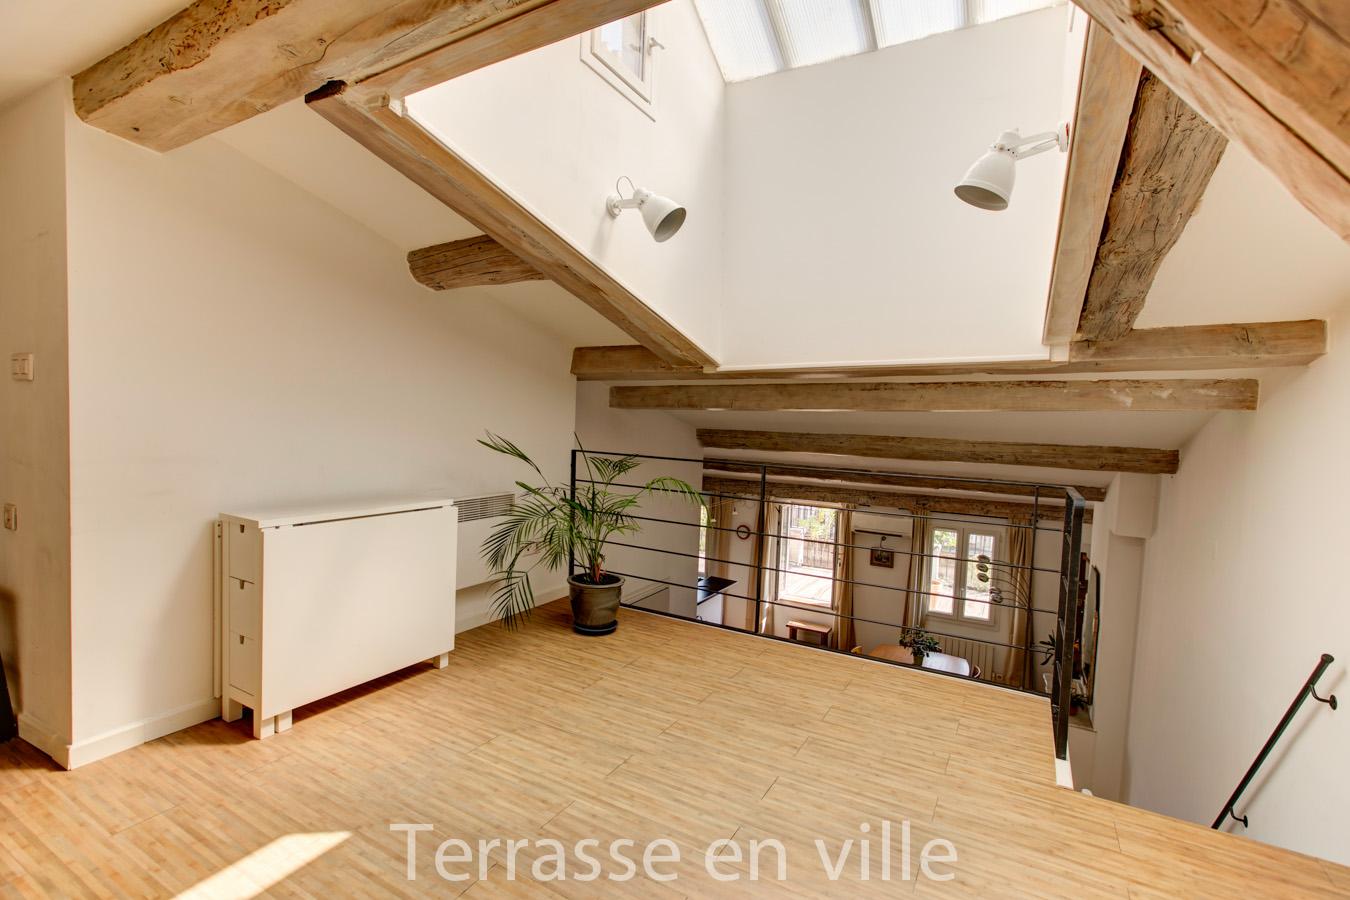 terrasse-8-2.jpg